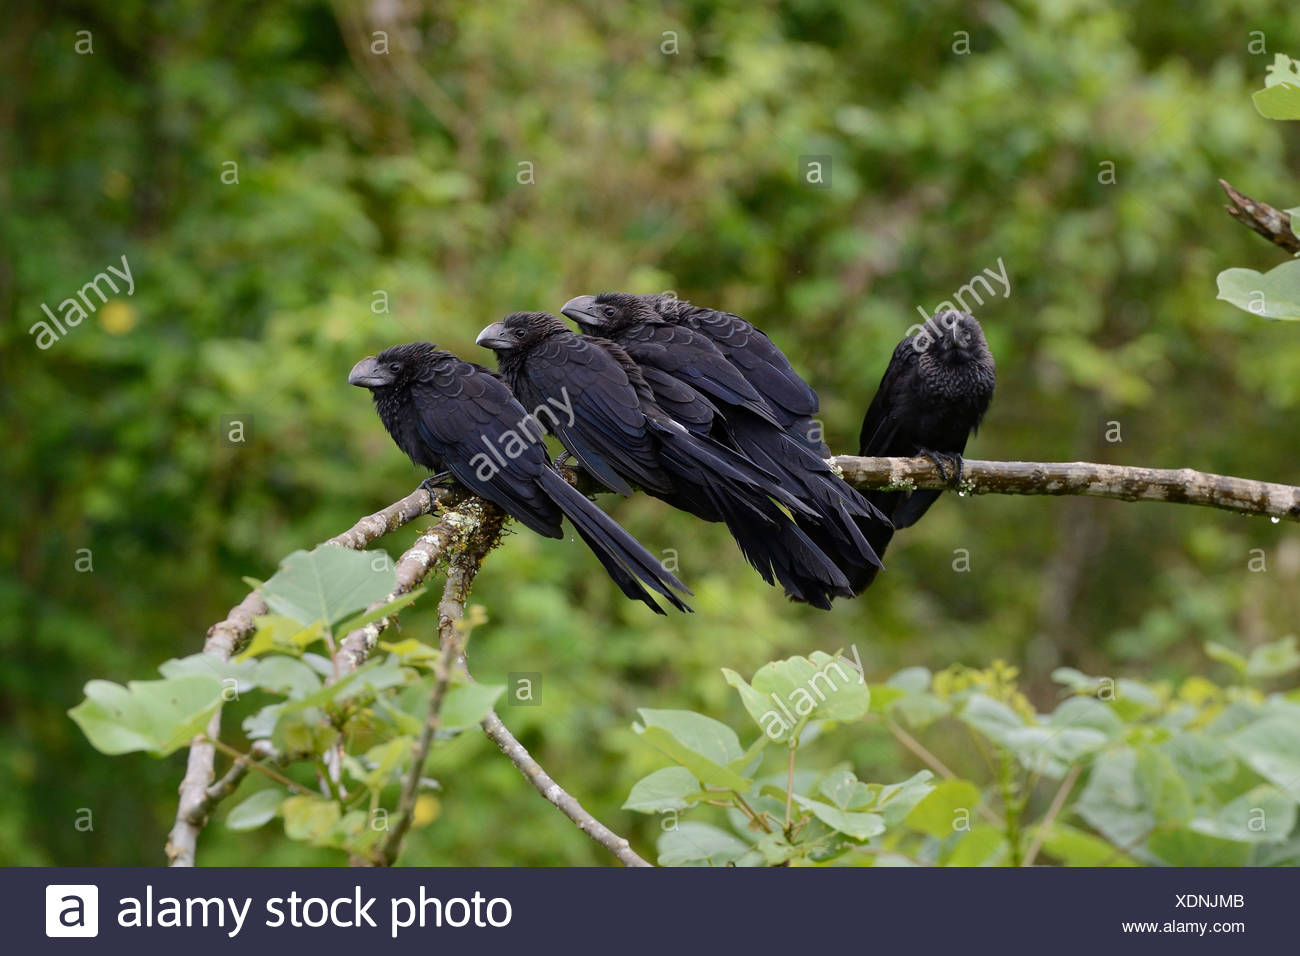 Glattschnabelani, Glattschnabel-Ani, Ani (Crotophaga ani), Gruppe sitzt auf einem Ast, Ecuador, Galapagos-Inseln, Santa Cruz | s - Stock Image